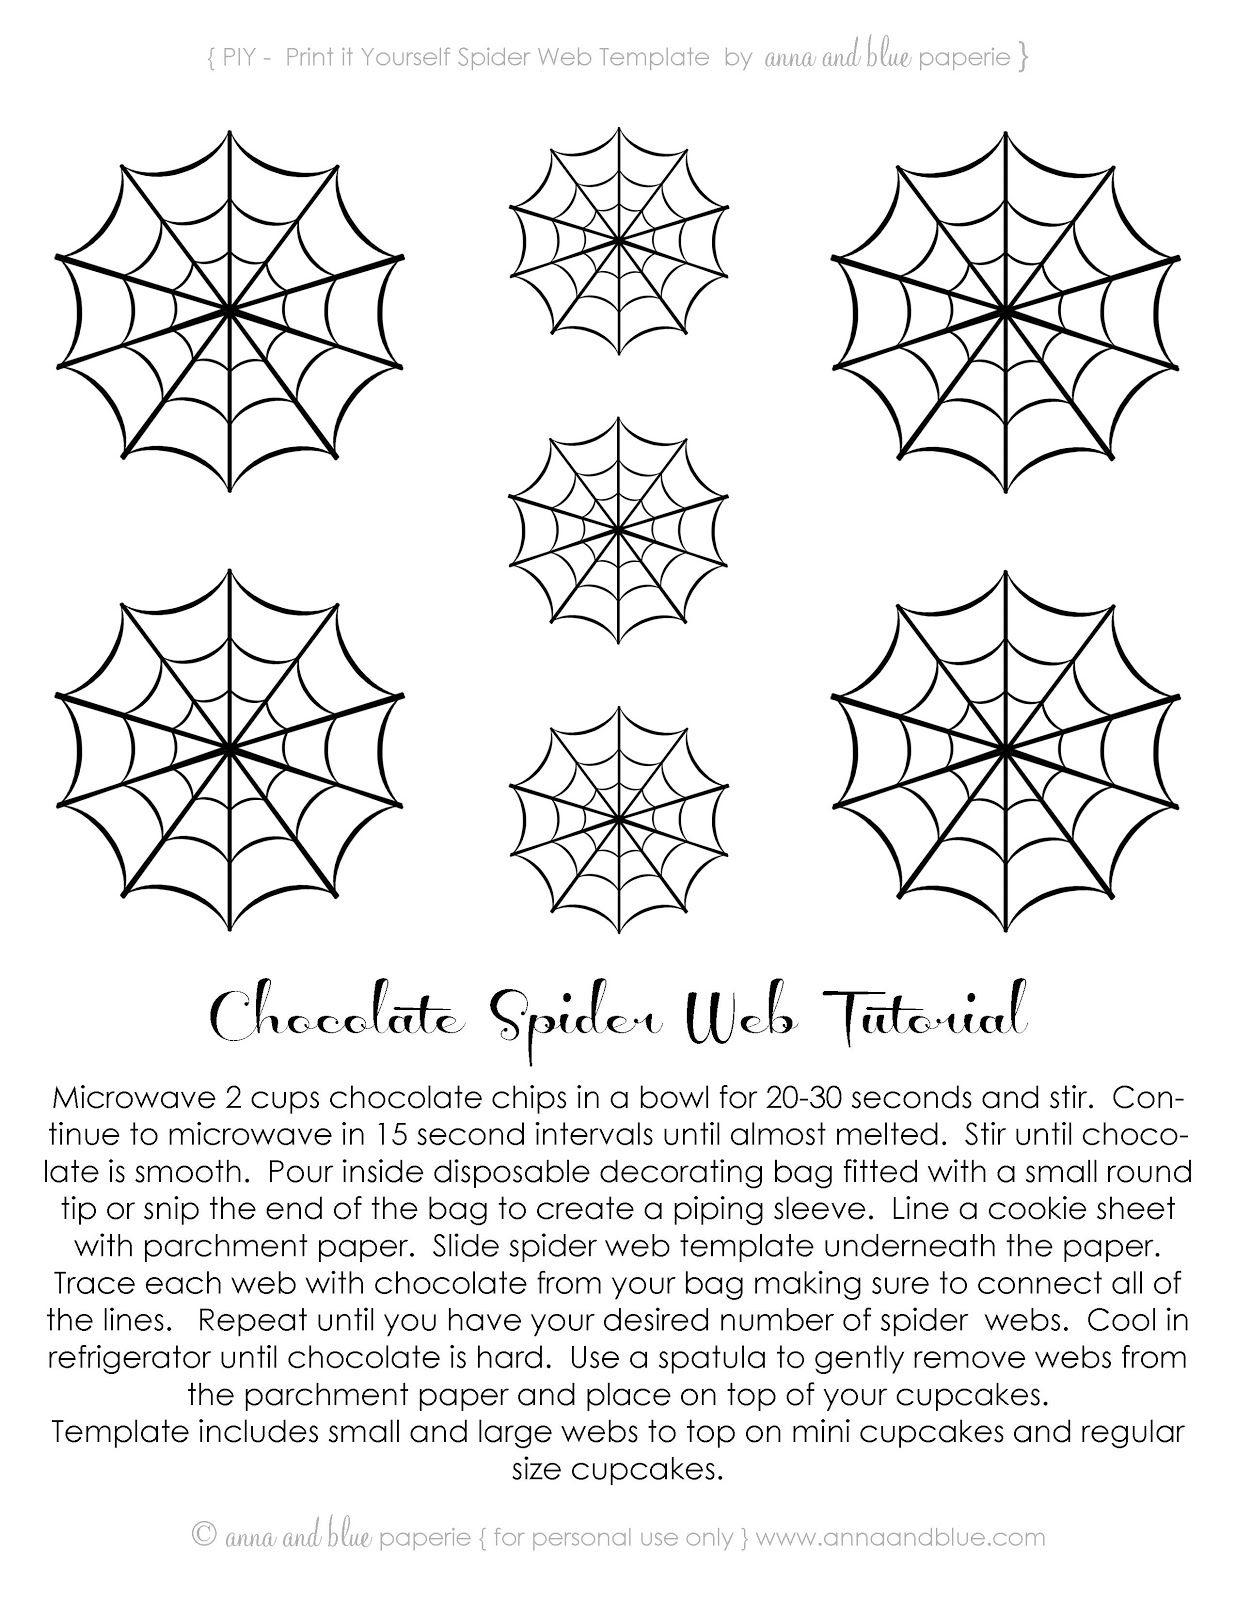 Free Printable~Chocolate Spider Web-Tutorial .<3Anna And Blue - Free Printable Spider Web